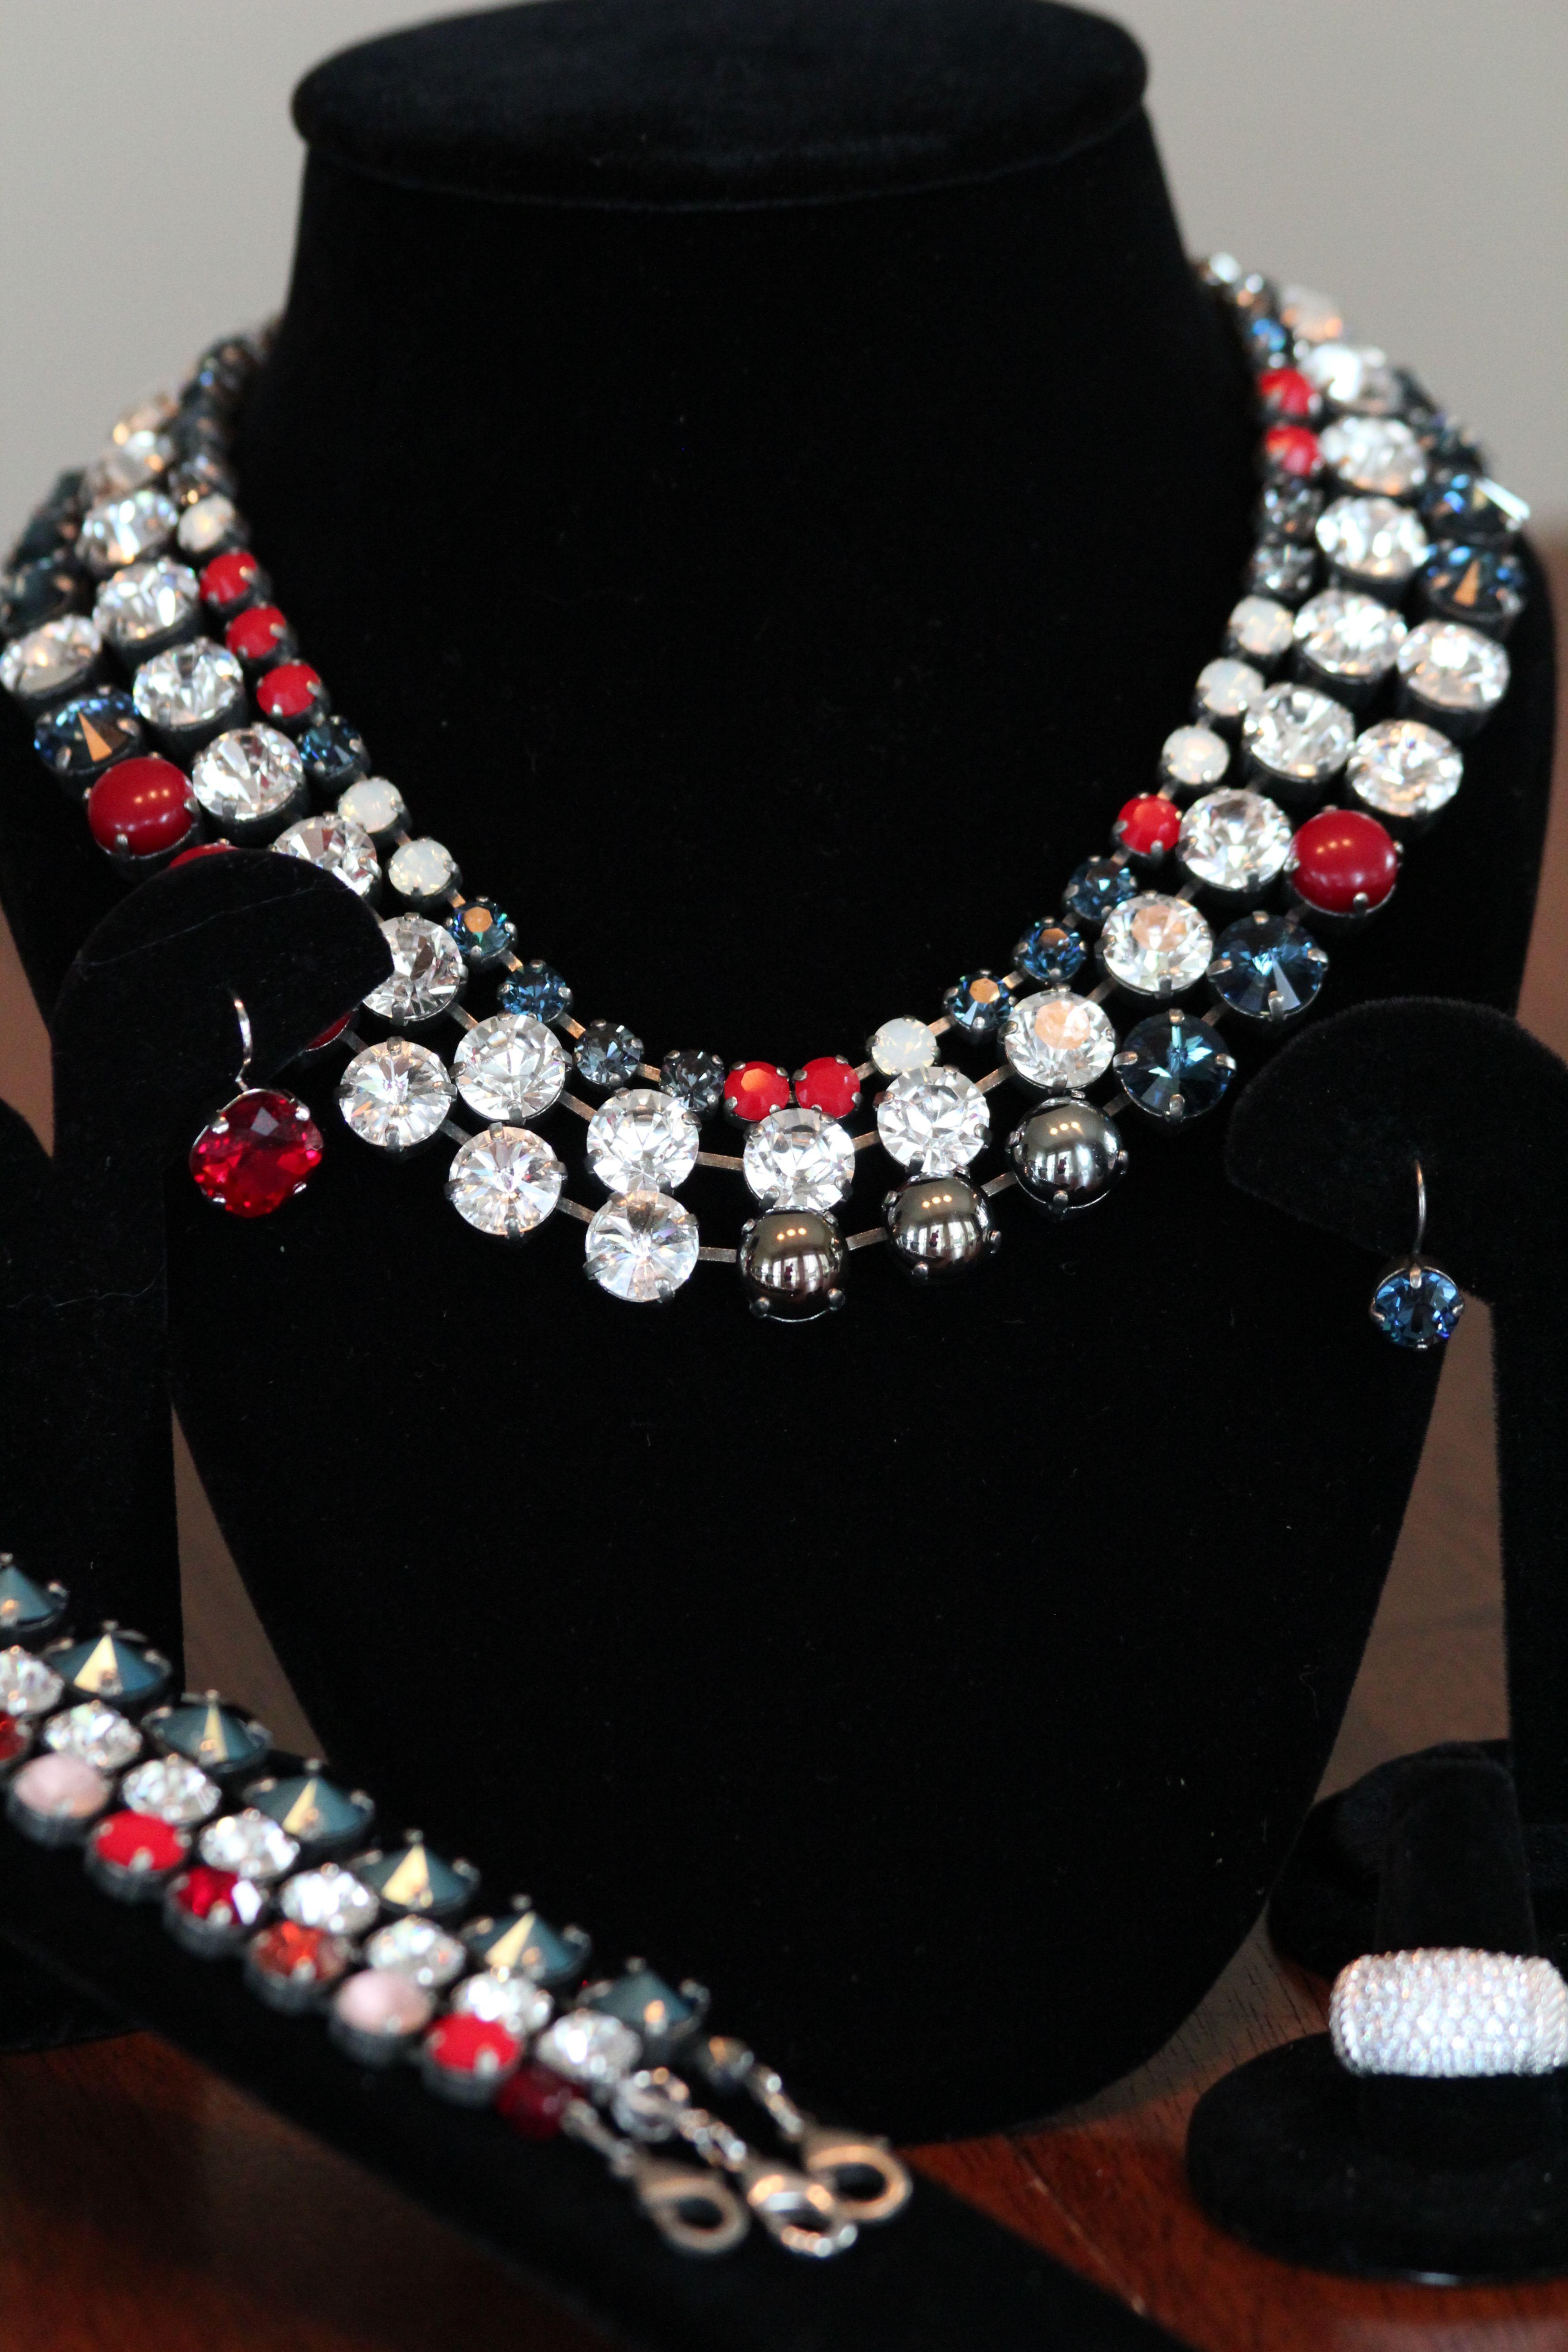 Sabika look necklace - Patriotic sabika look sabikalove sabika